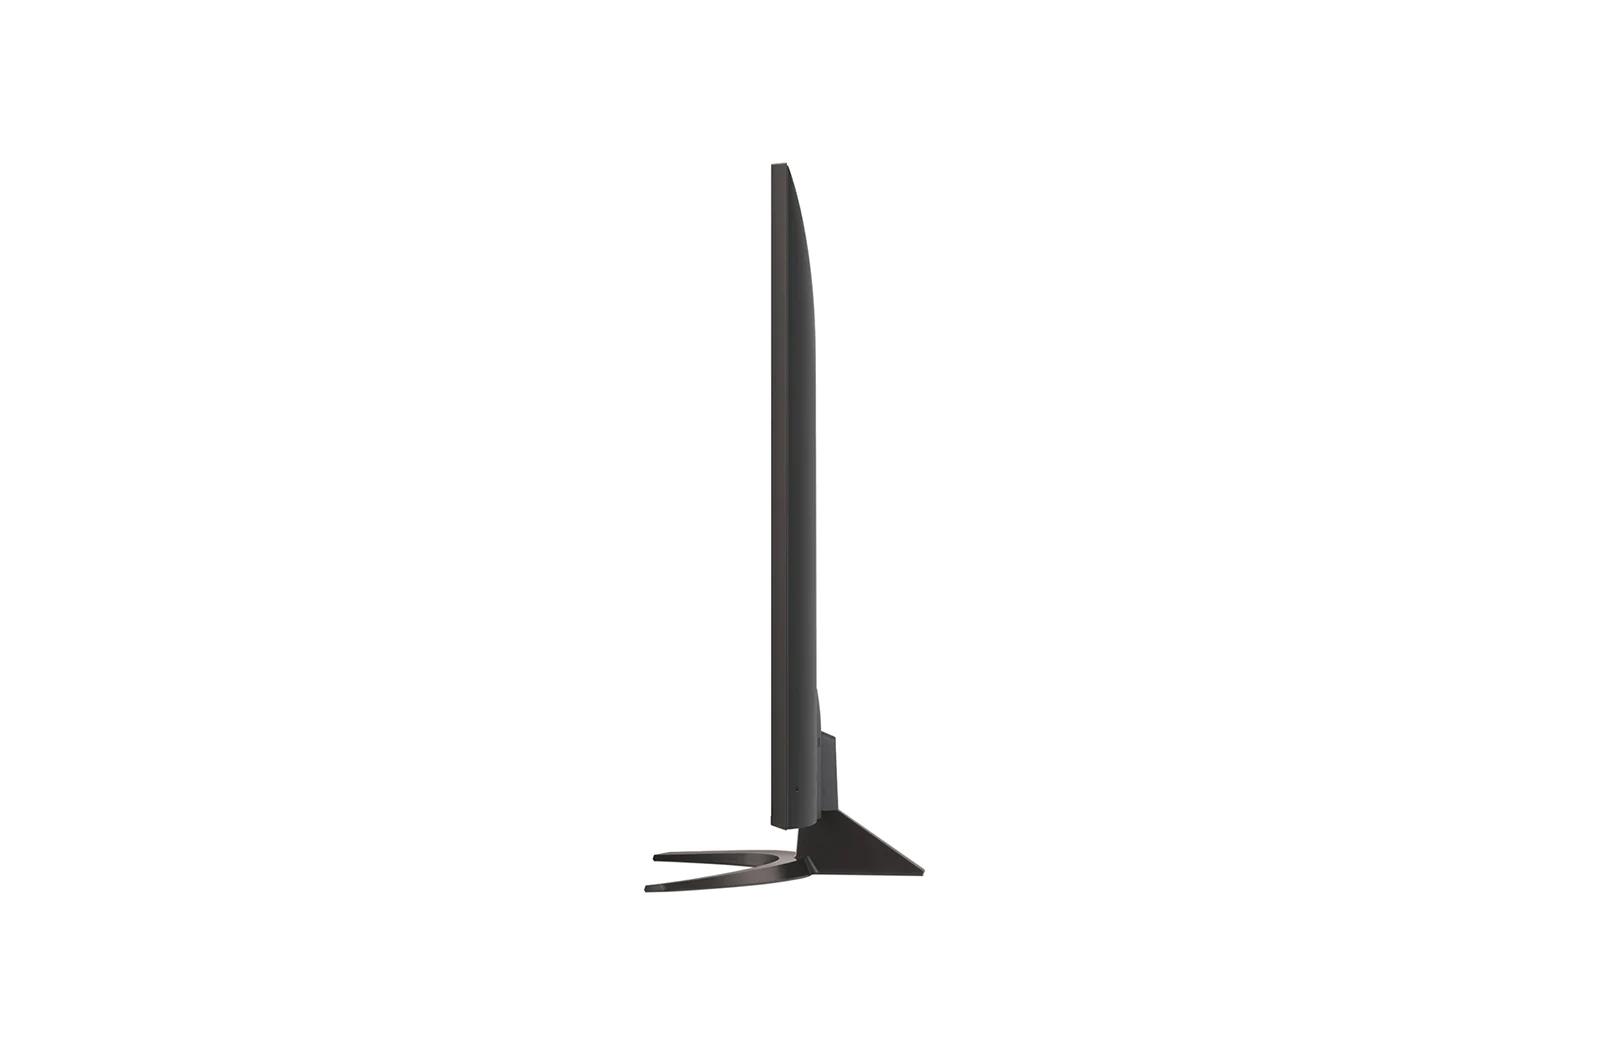 Televizor LG LED 55UP78006LC  - 3